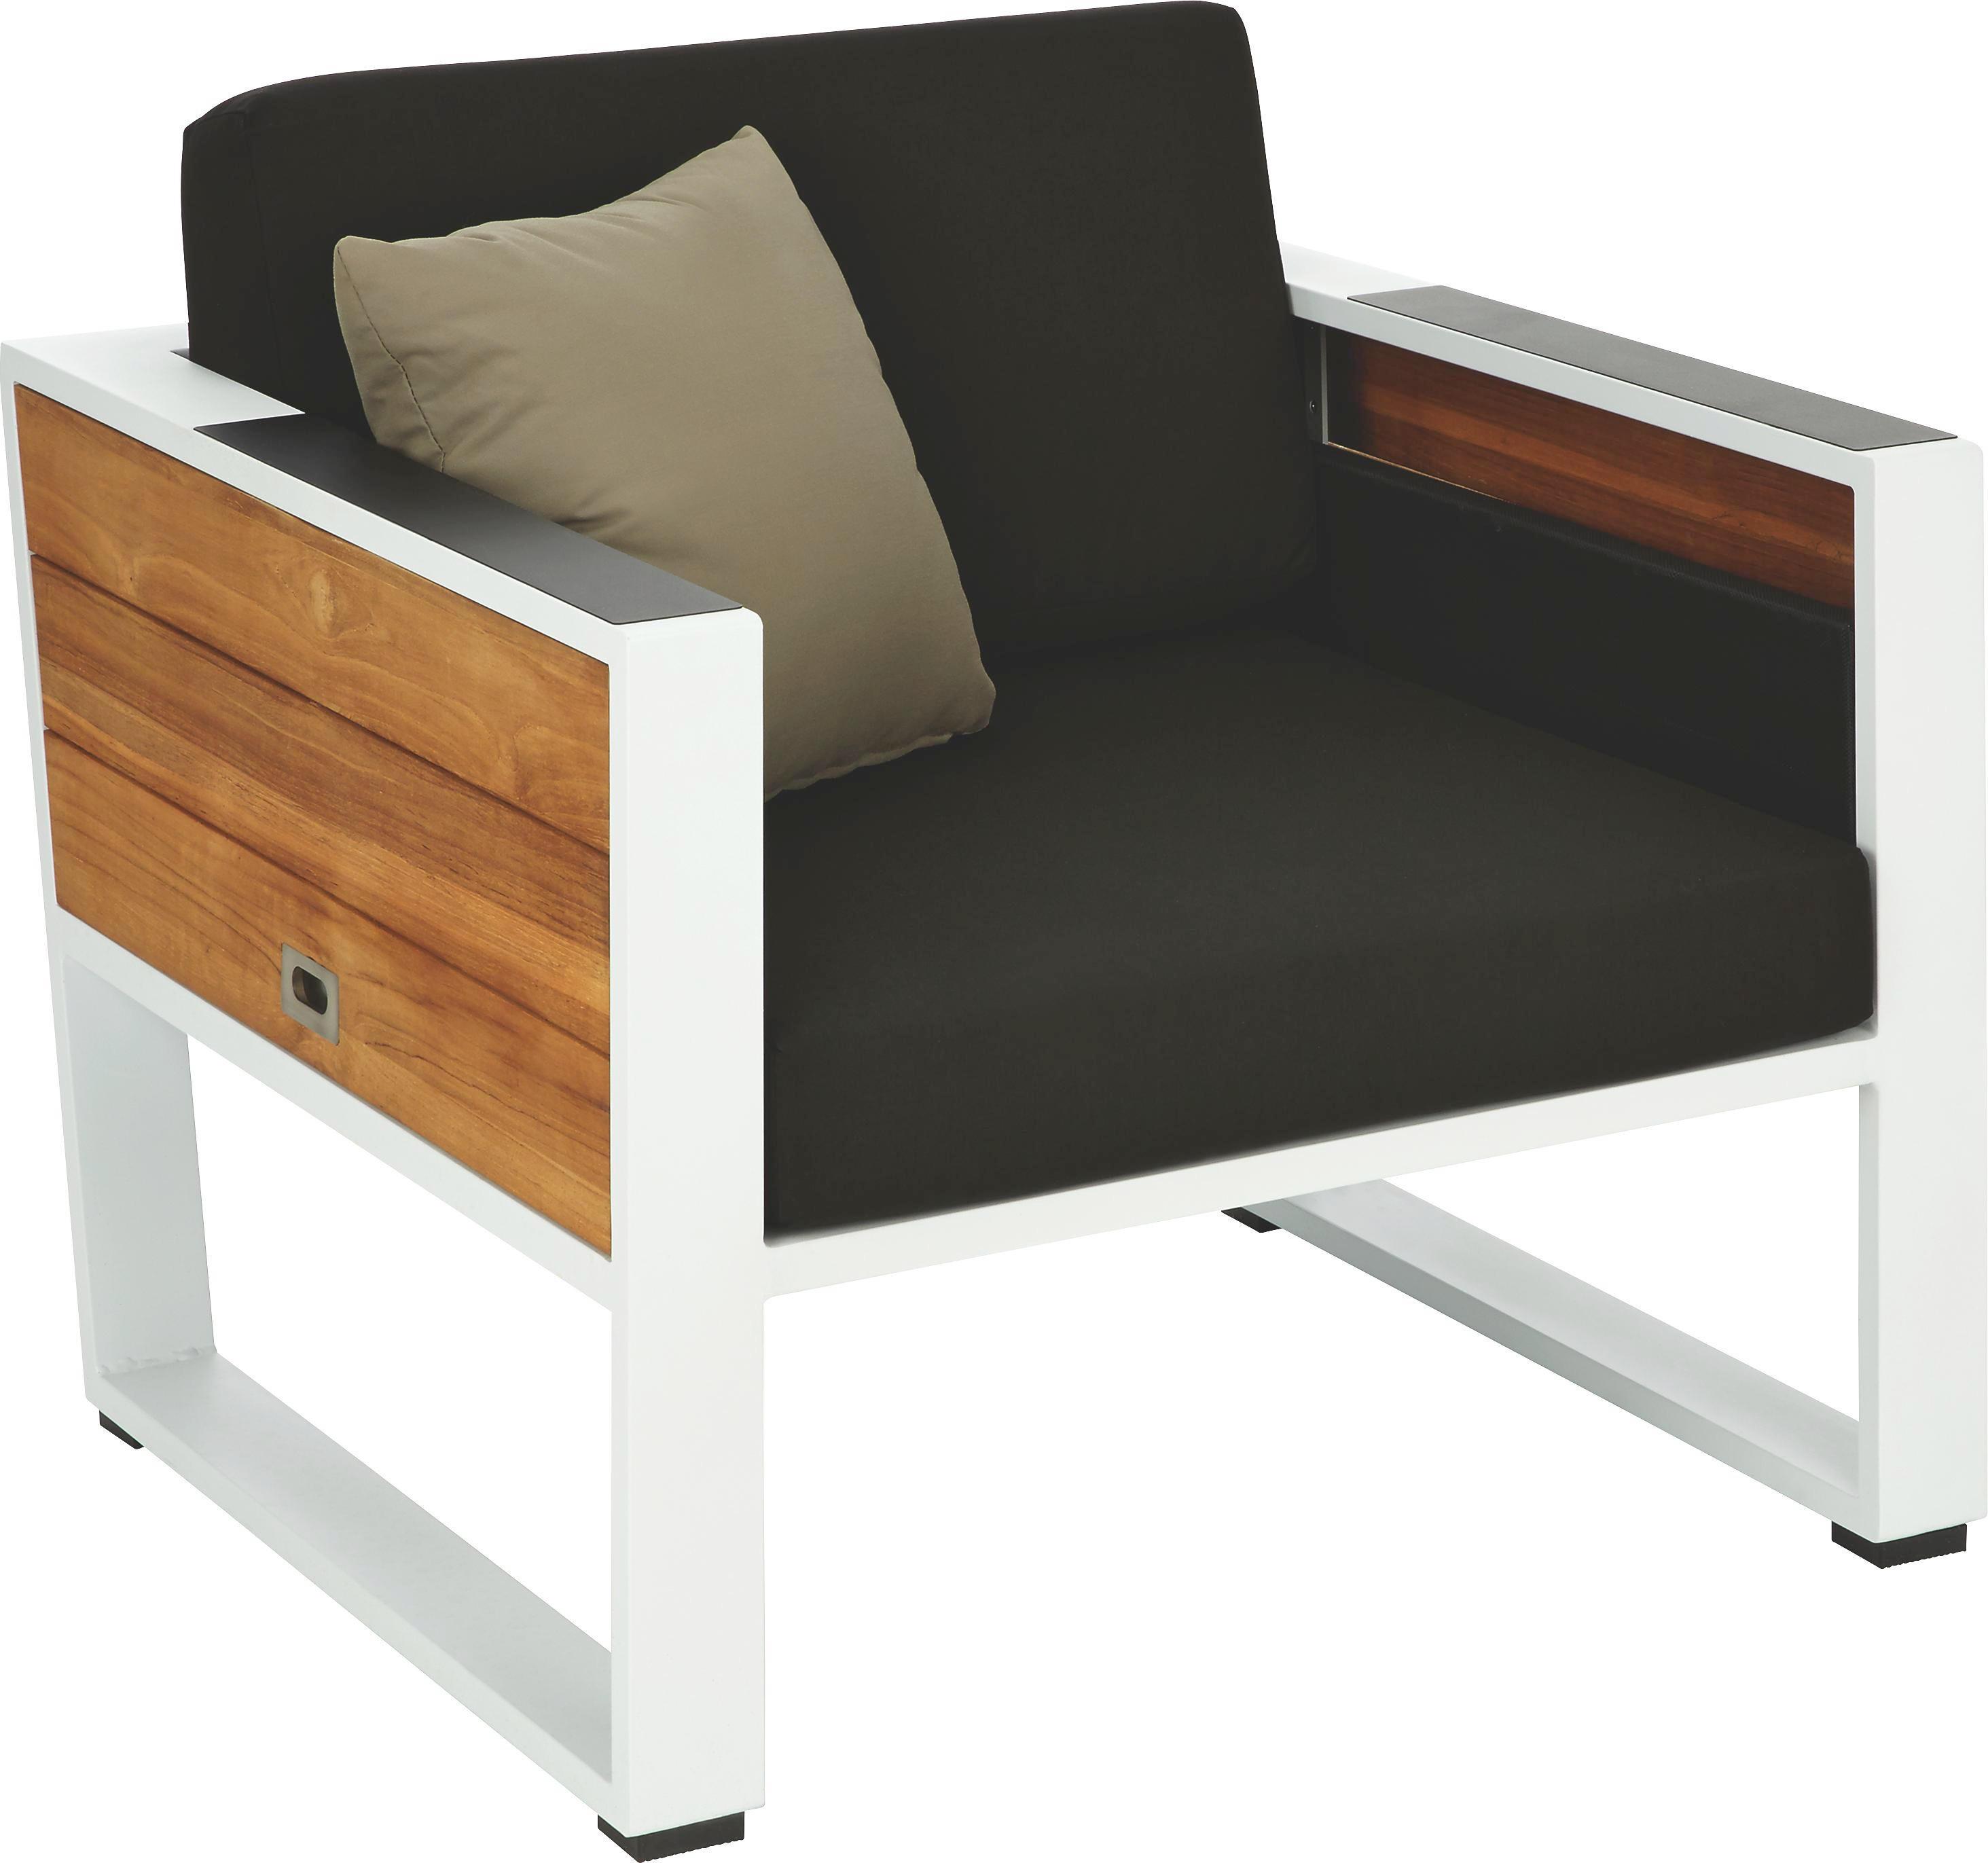 LOUNGE FOTELJA - bijela/siva, Design, drvo/metal (84/61/81,5cm) - AMBIA GARDEN